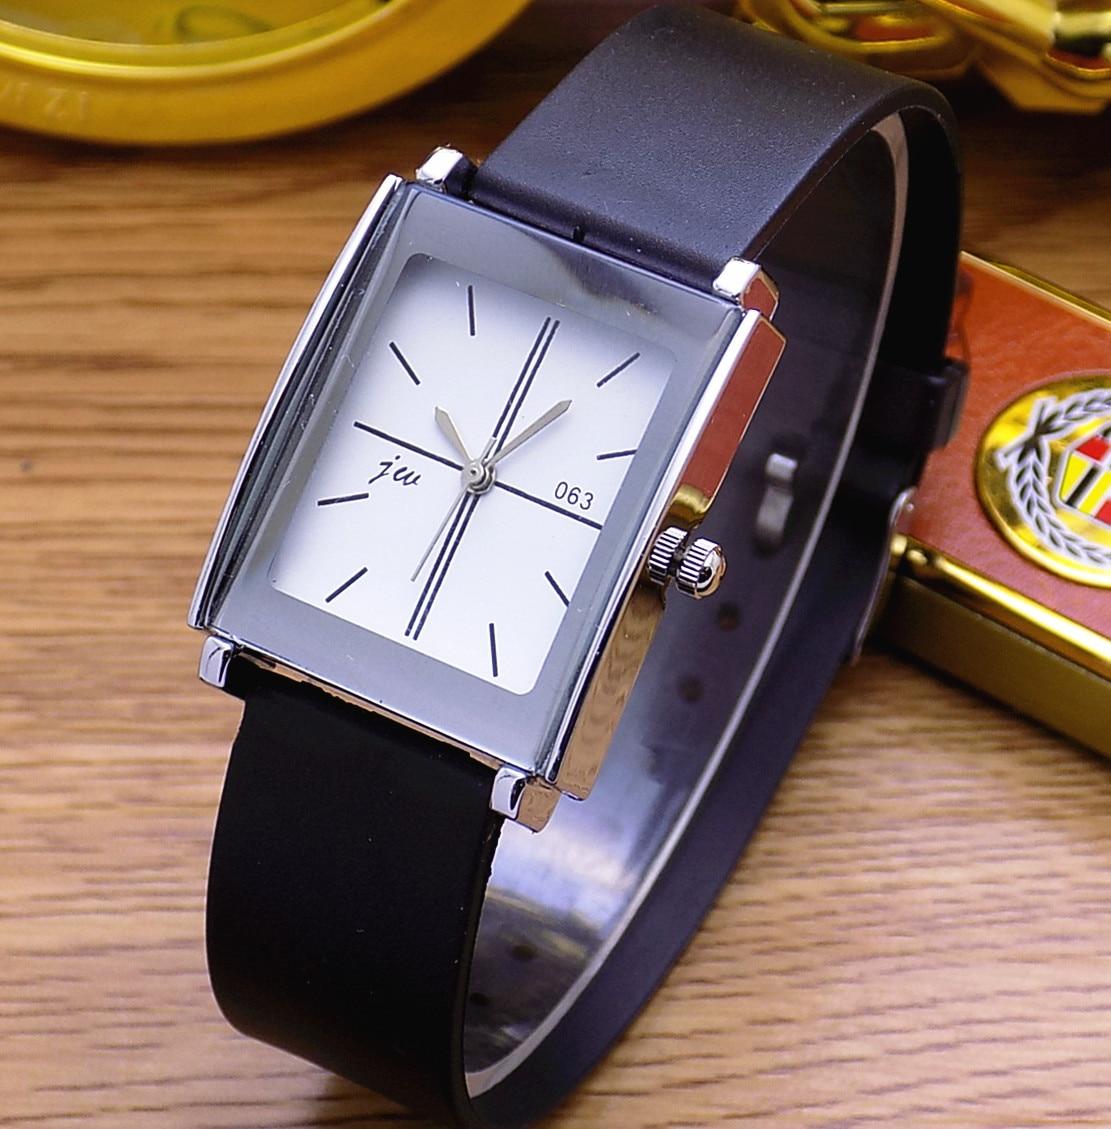 Fashion Jw Brand Casual Quartz Women Men Lover Clock Leather Strap Student Watch Business Square Wristwatches Relogio Masculino